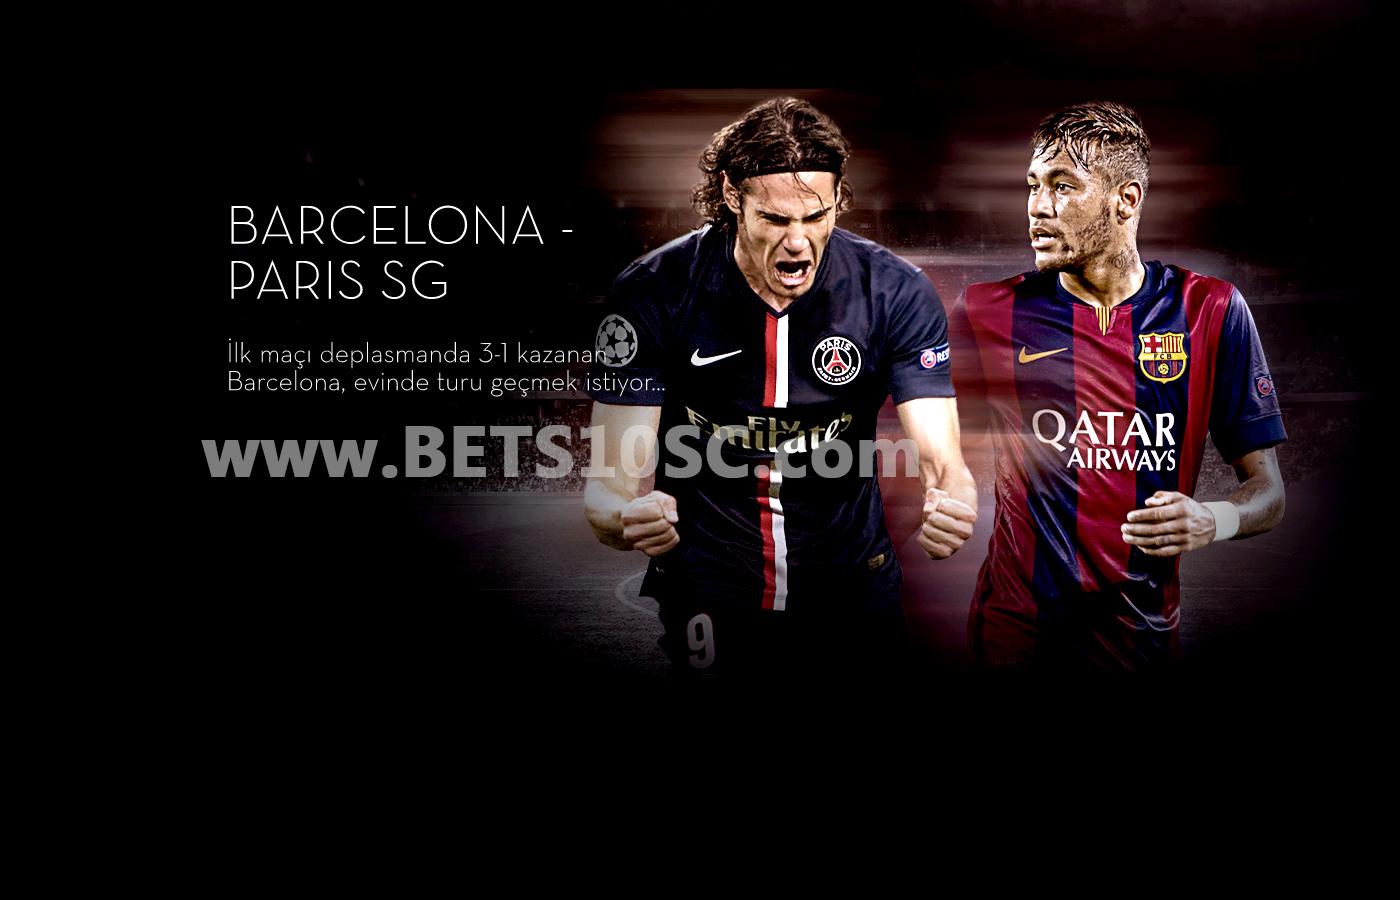 Bets10 Barcelona - Paris SG Maçı